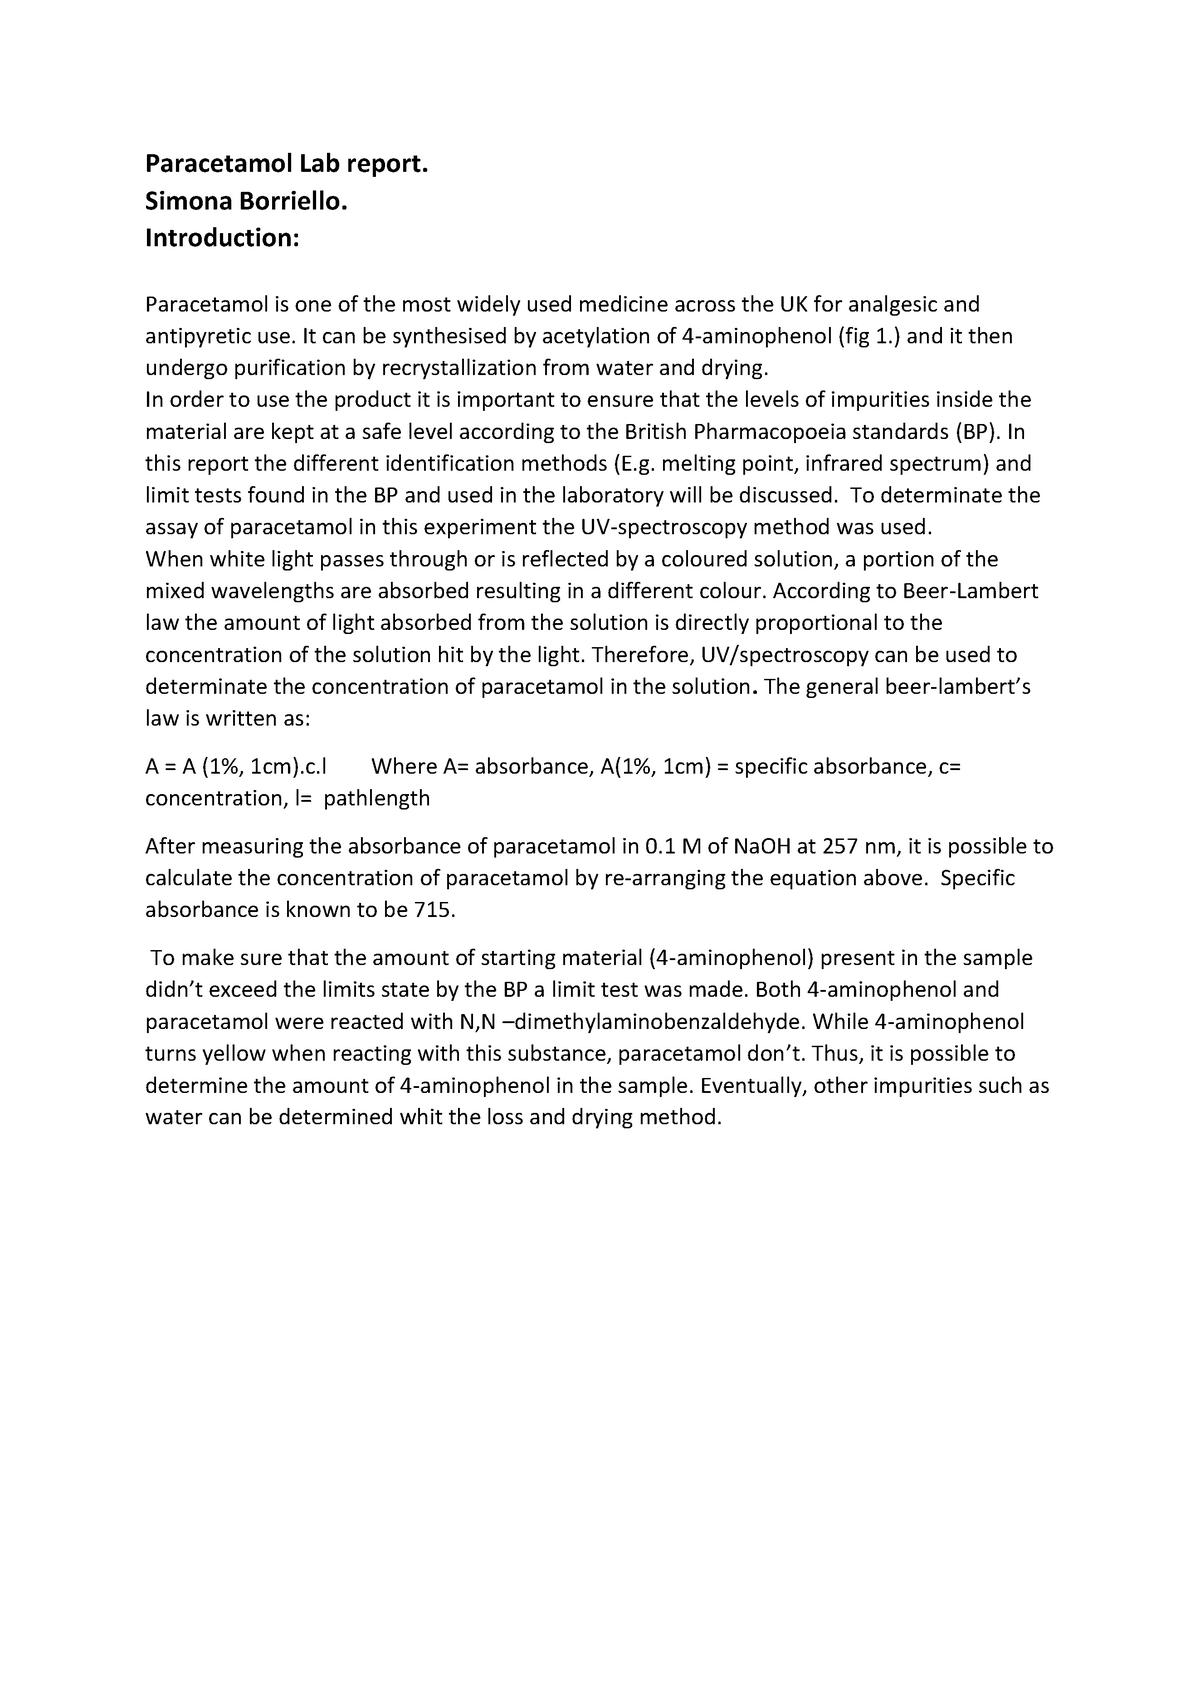 Paracetamol Lab Report A Widely Used Medicine Across The Uk Studocu